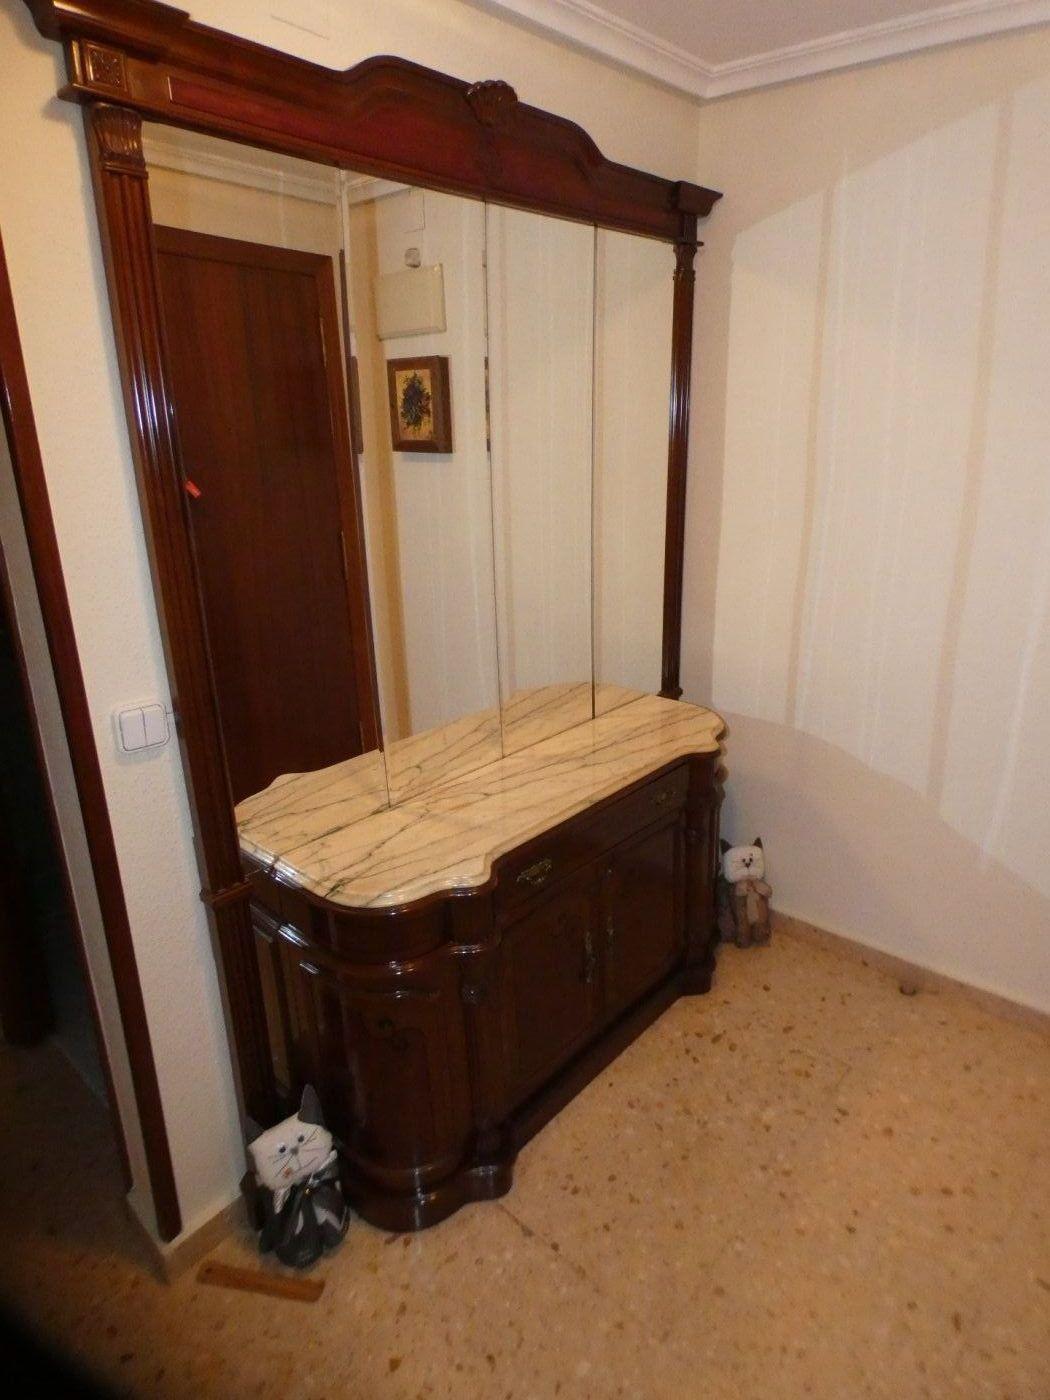 Piso 4 dormitorios tombola - imagenInmueble12